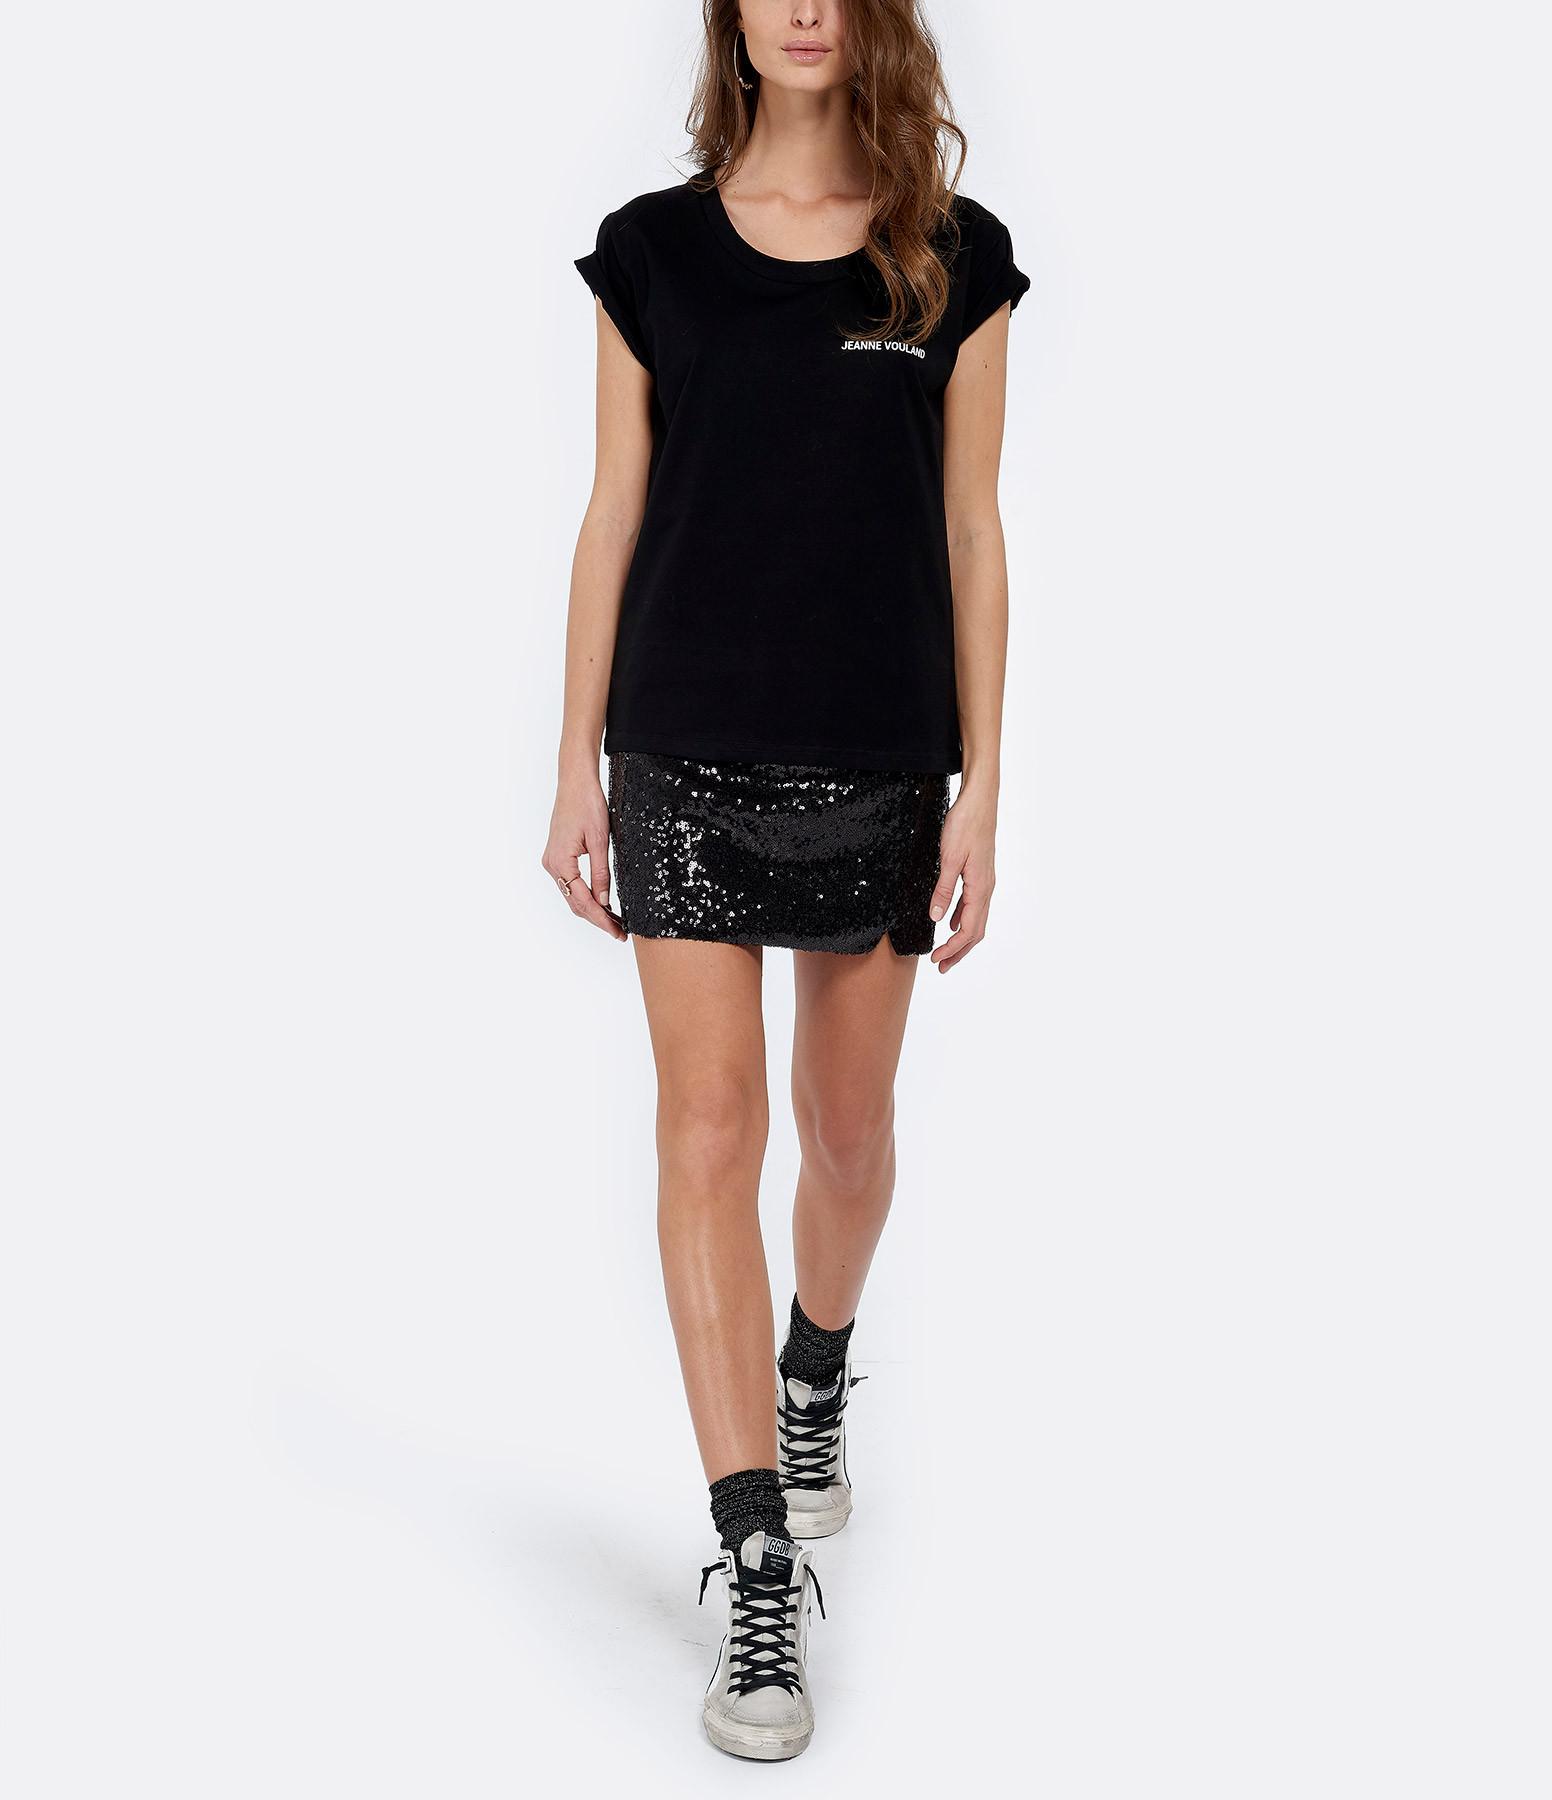 JEANNE VOULAND - Tee-shirt Ari JV Col Rond Noir Imprimé Blanc